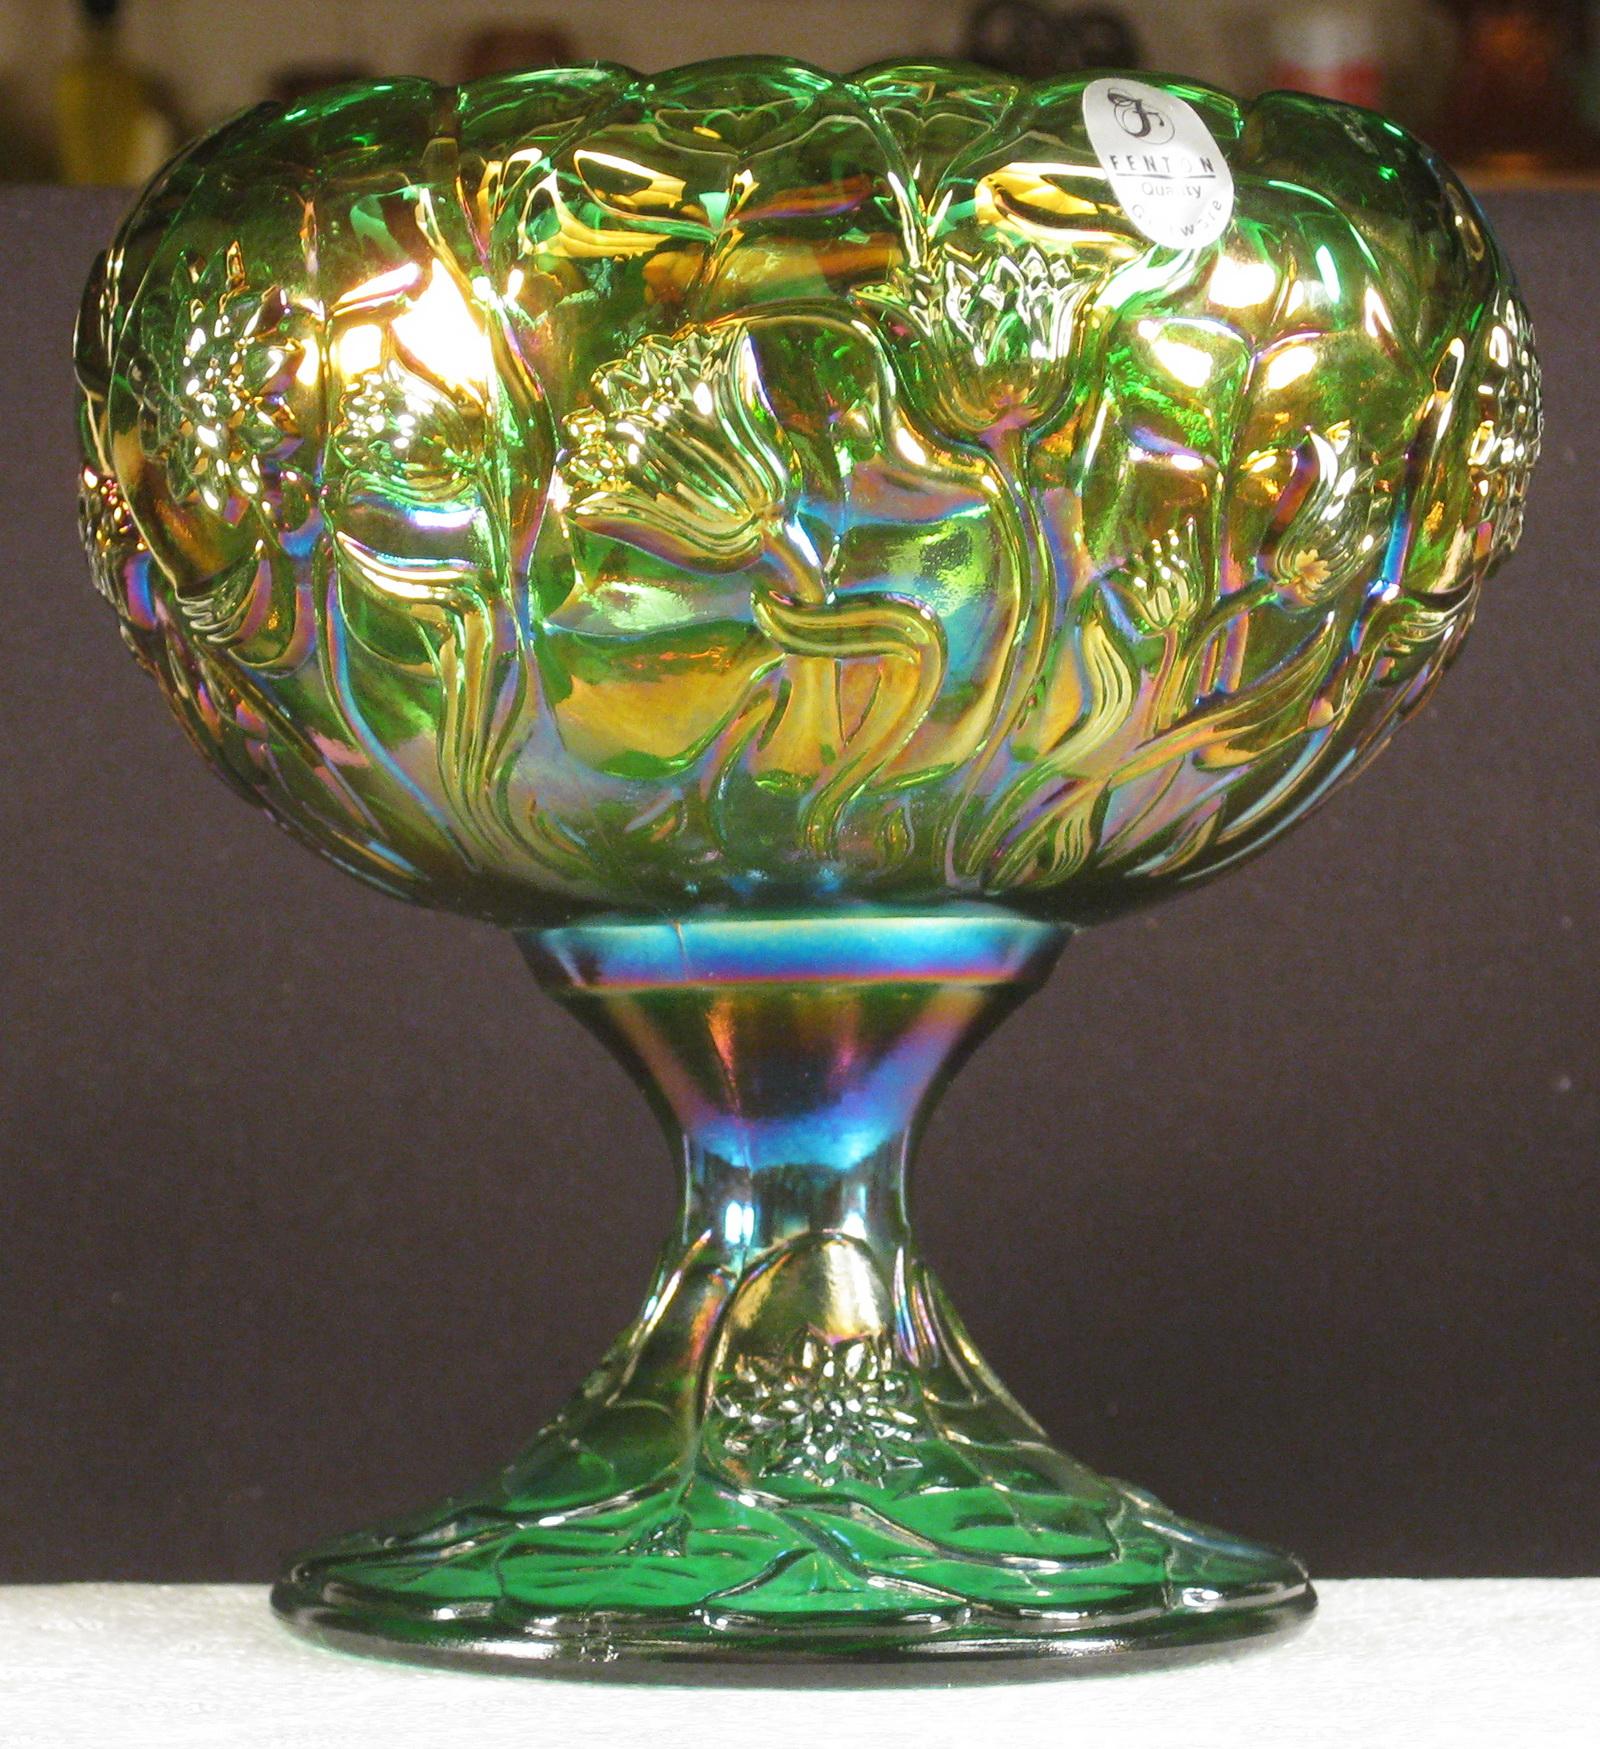 Carnival Green Glass Bowl